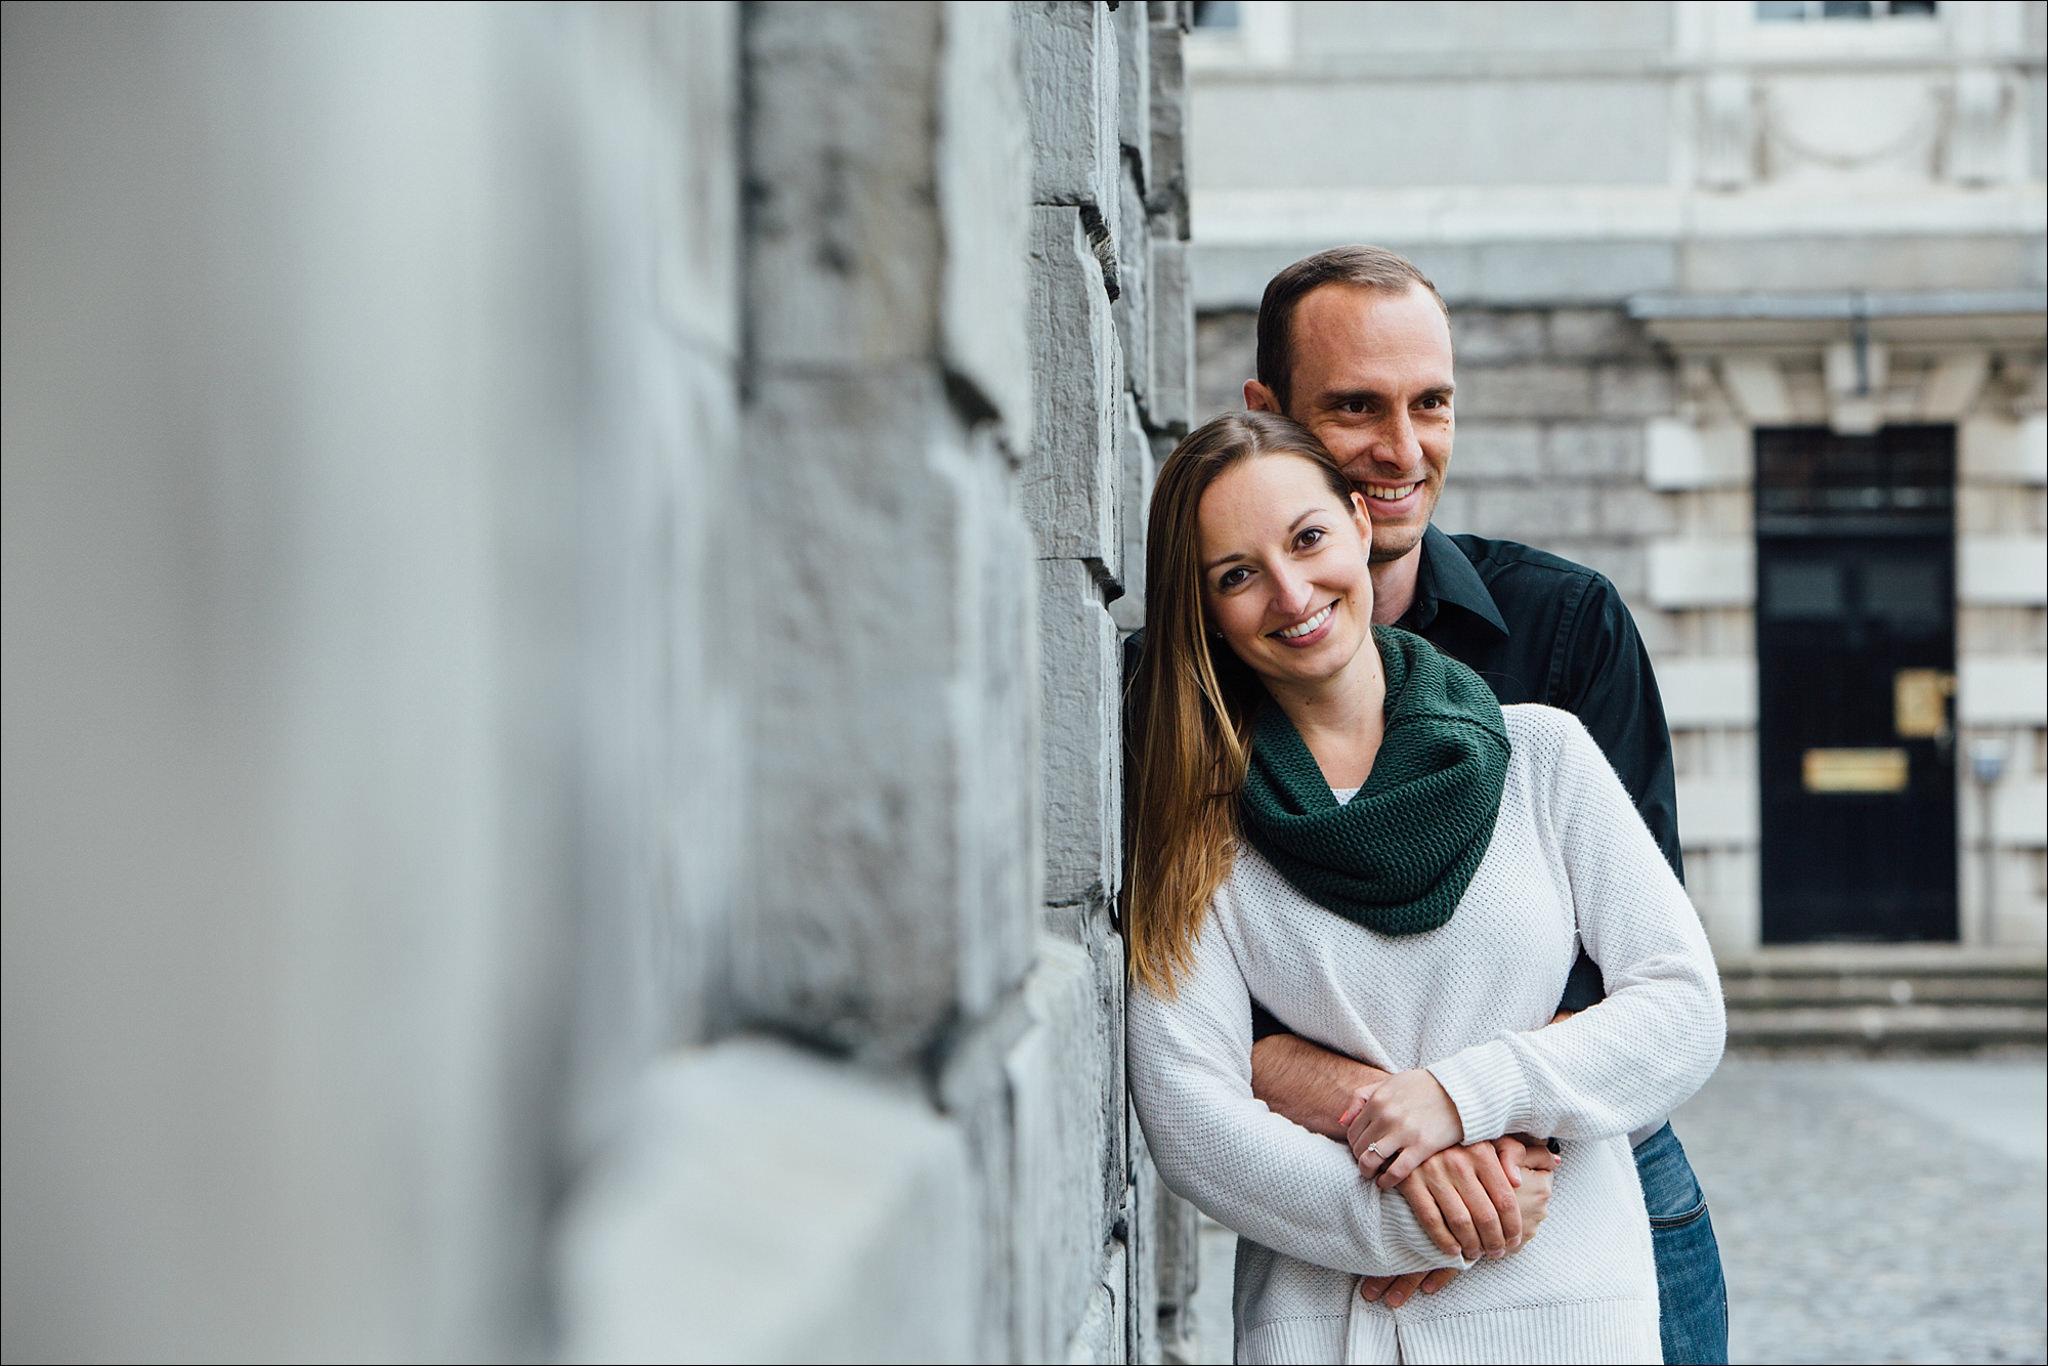 dublin wedding photographer david duignan photography engagement couple city photo shoot  ireland 0021